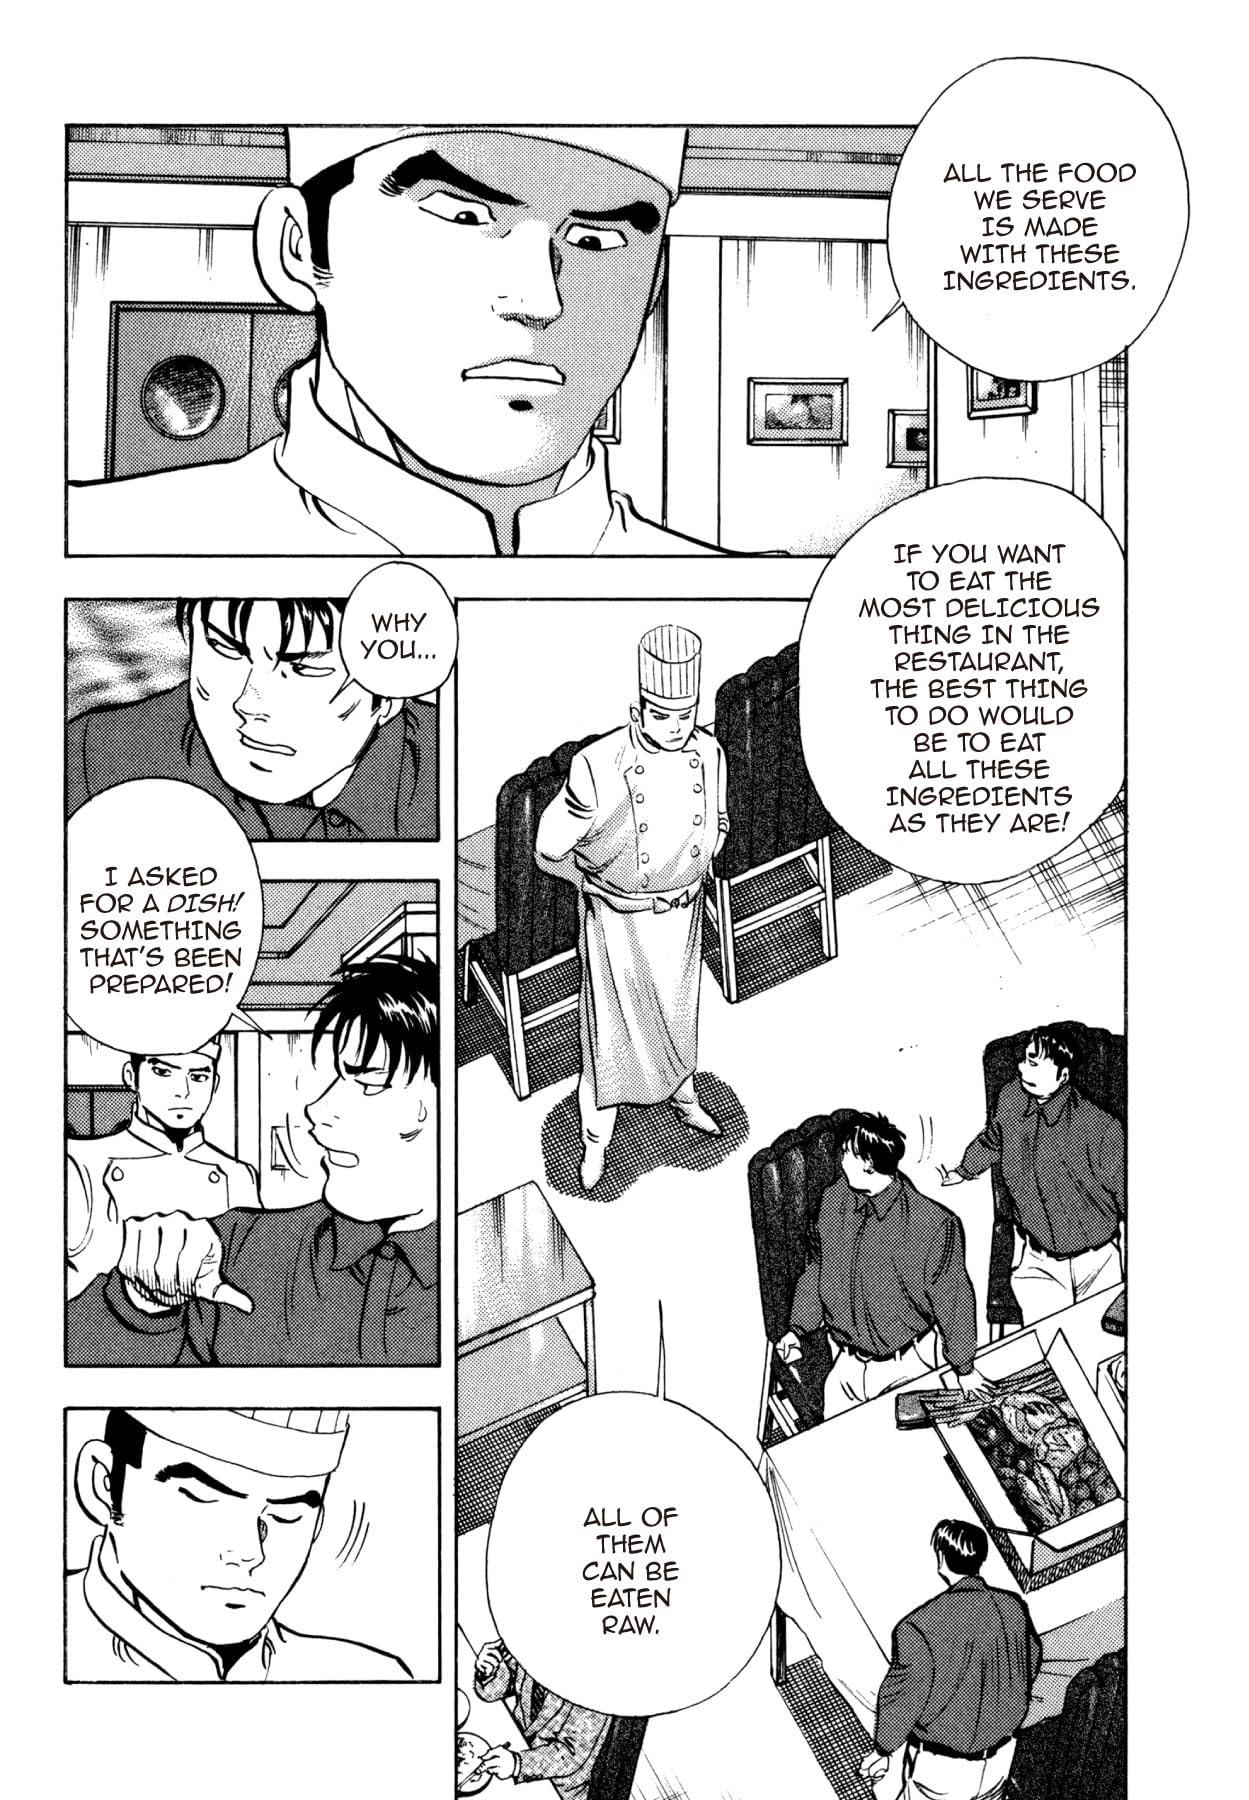 SUPER SHOKU KING #22